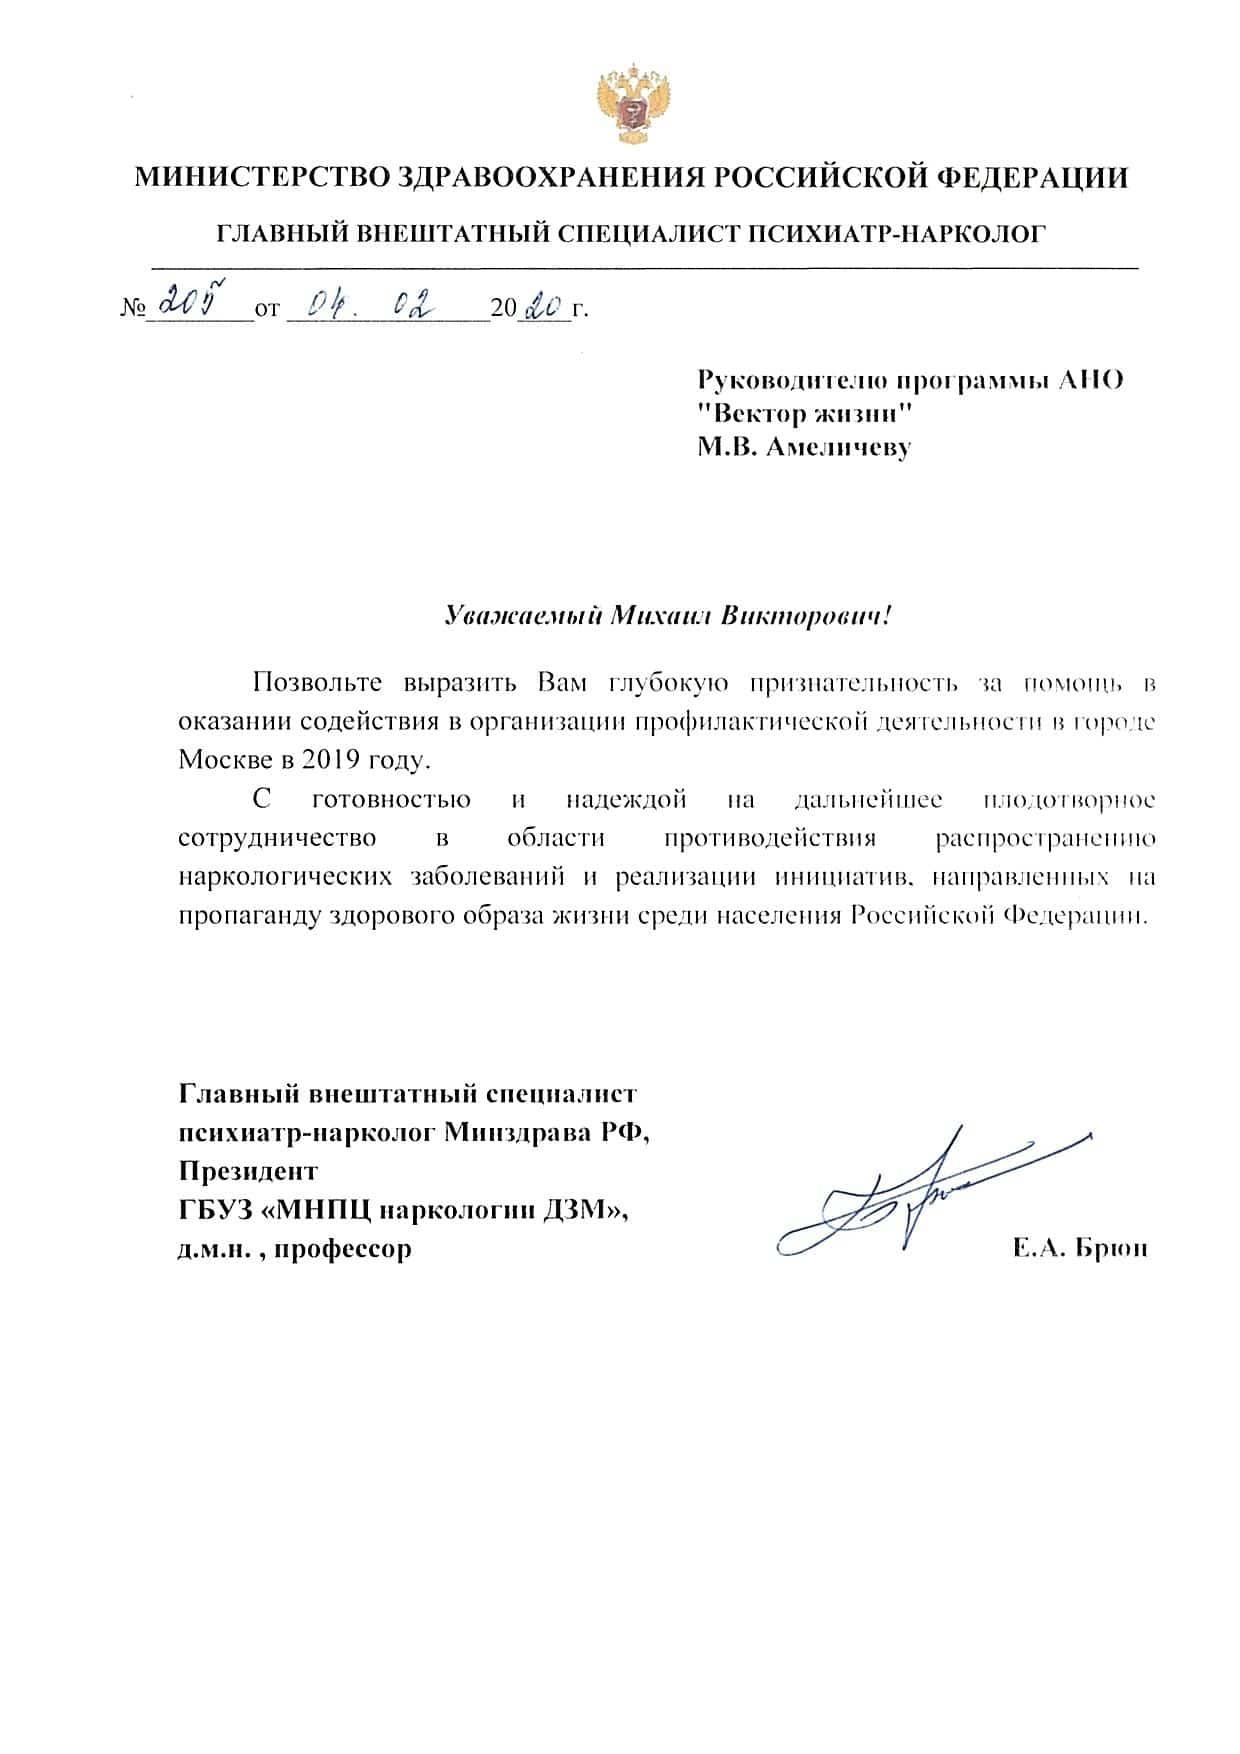 Амеличев Михаил Викторович 4